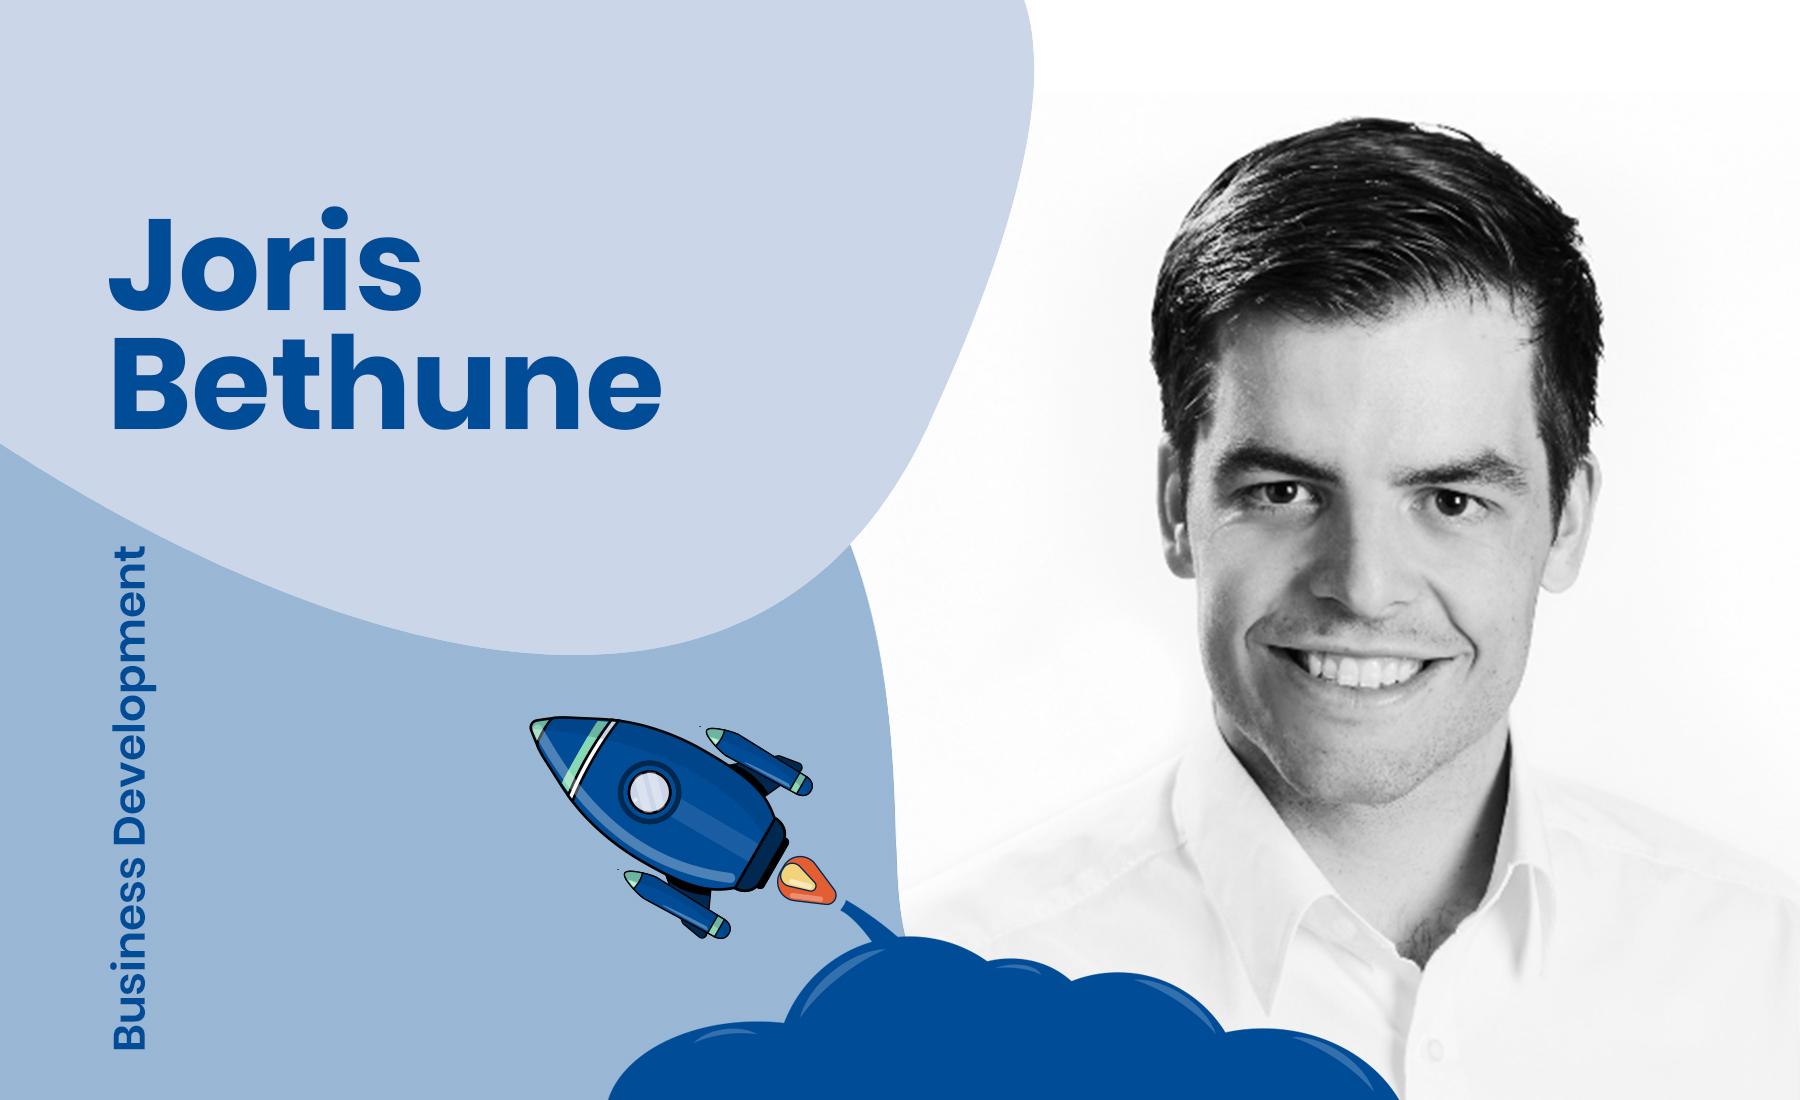 Interview with Business Development Manager, Joris Bethune